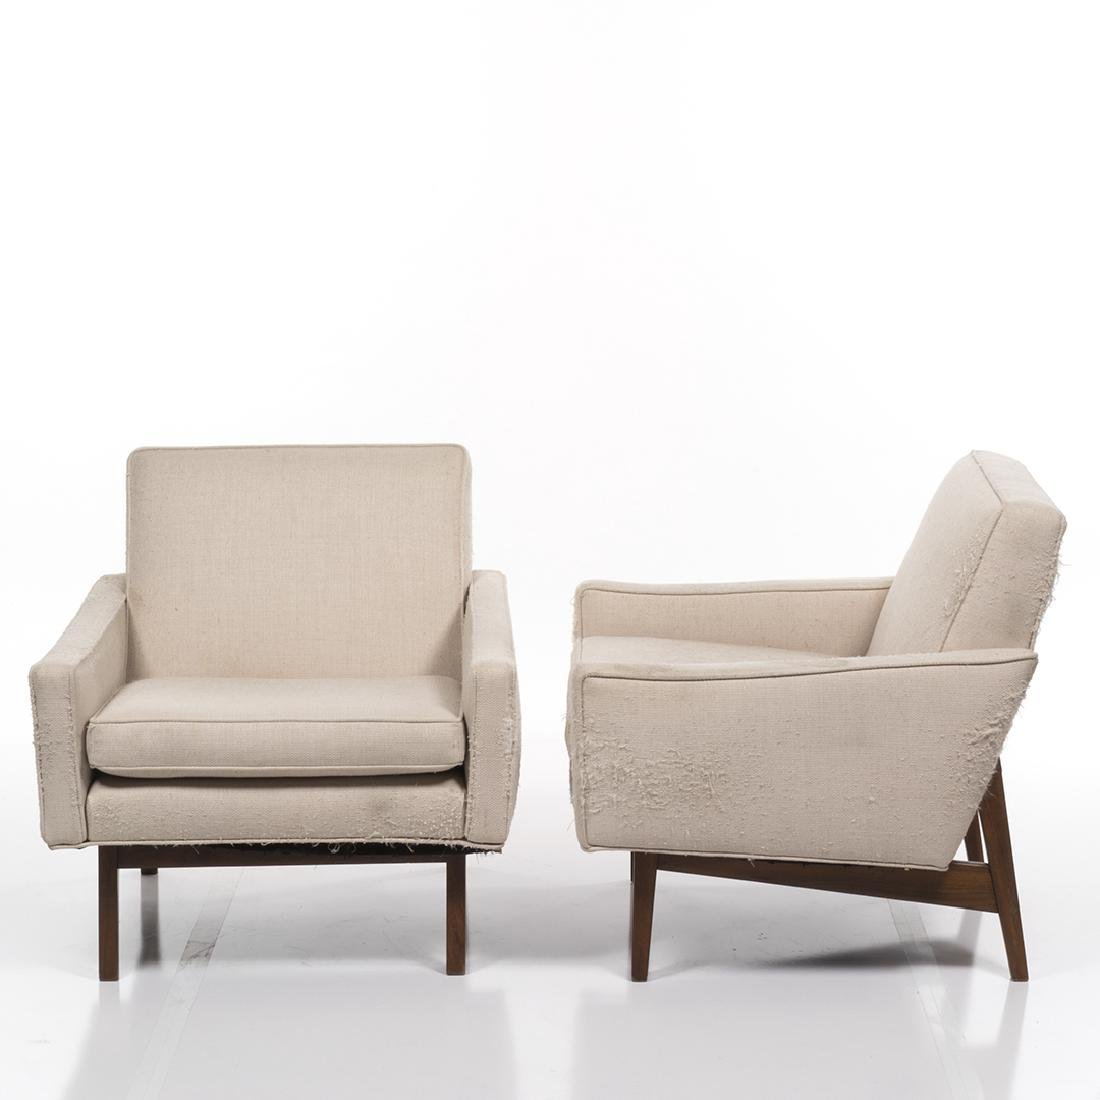 Jens Risom Lounge Chairs (2) - 2